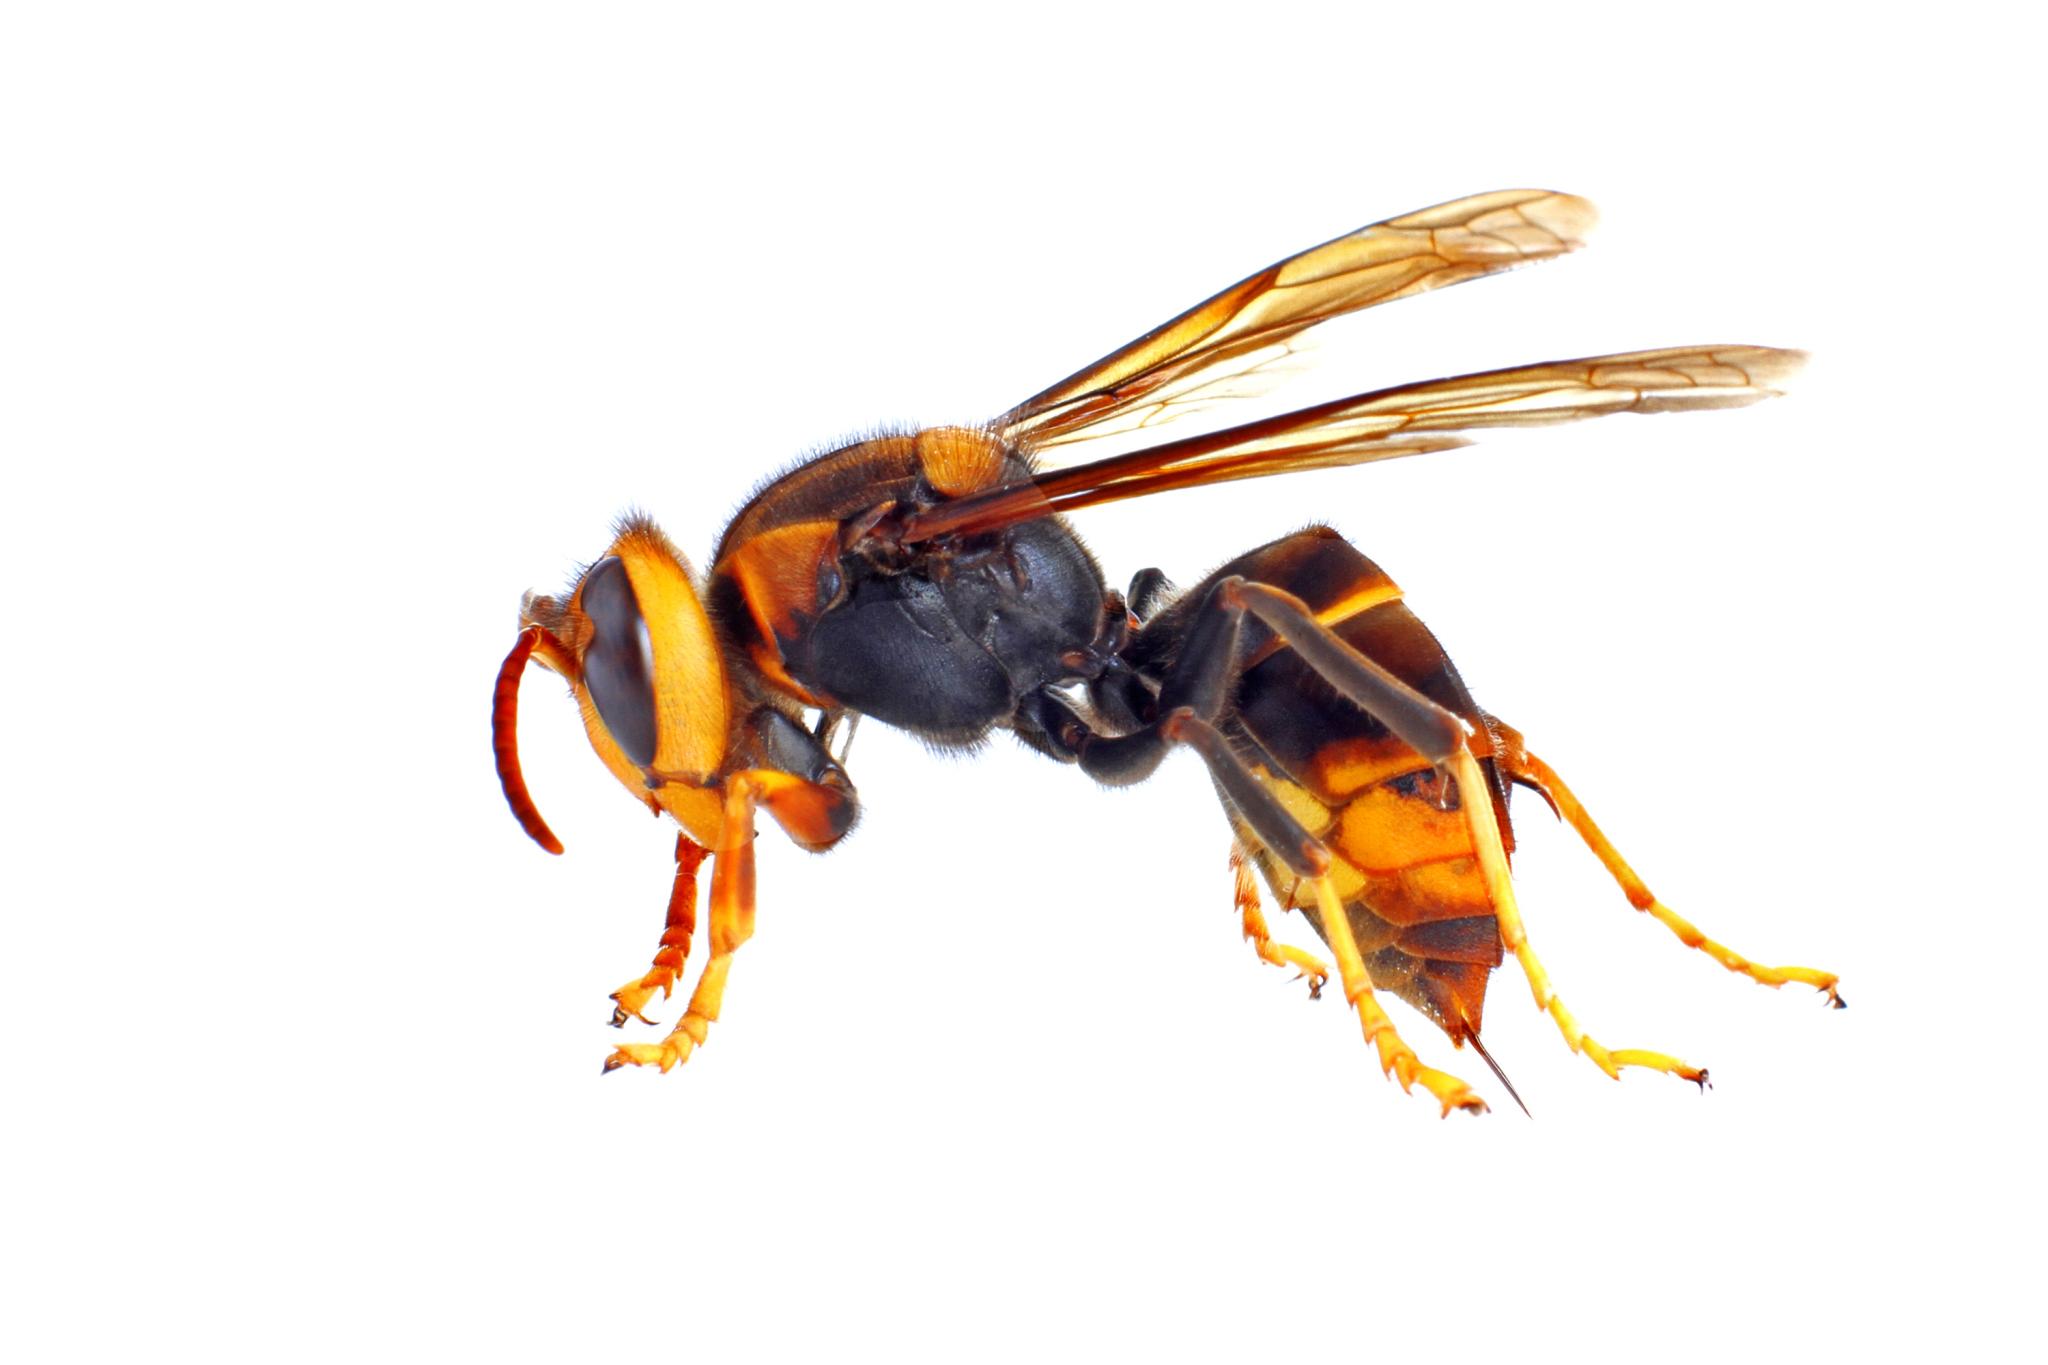 The Asian hornet (Vespa velutina)